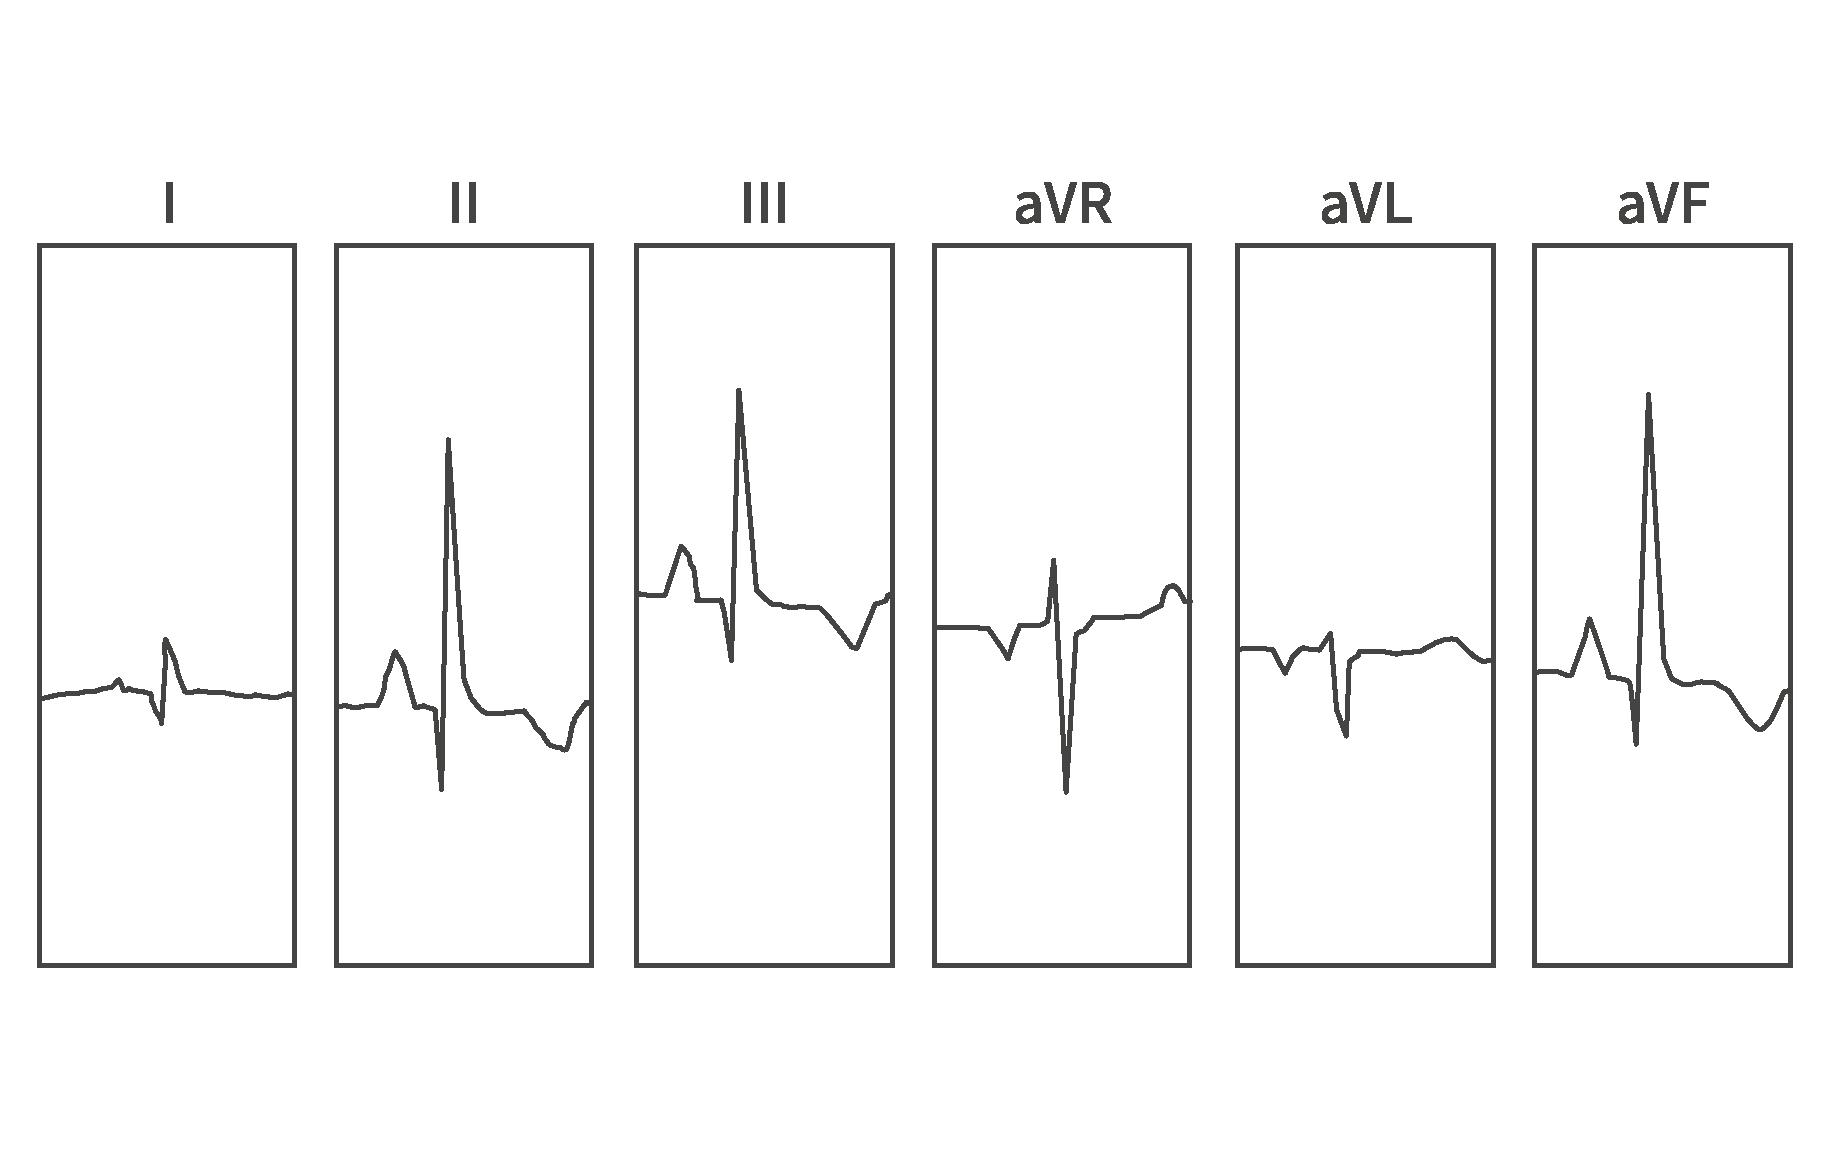 6-lead ECG